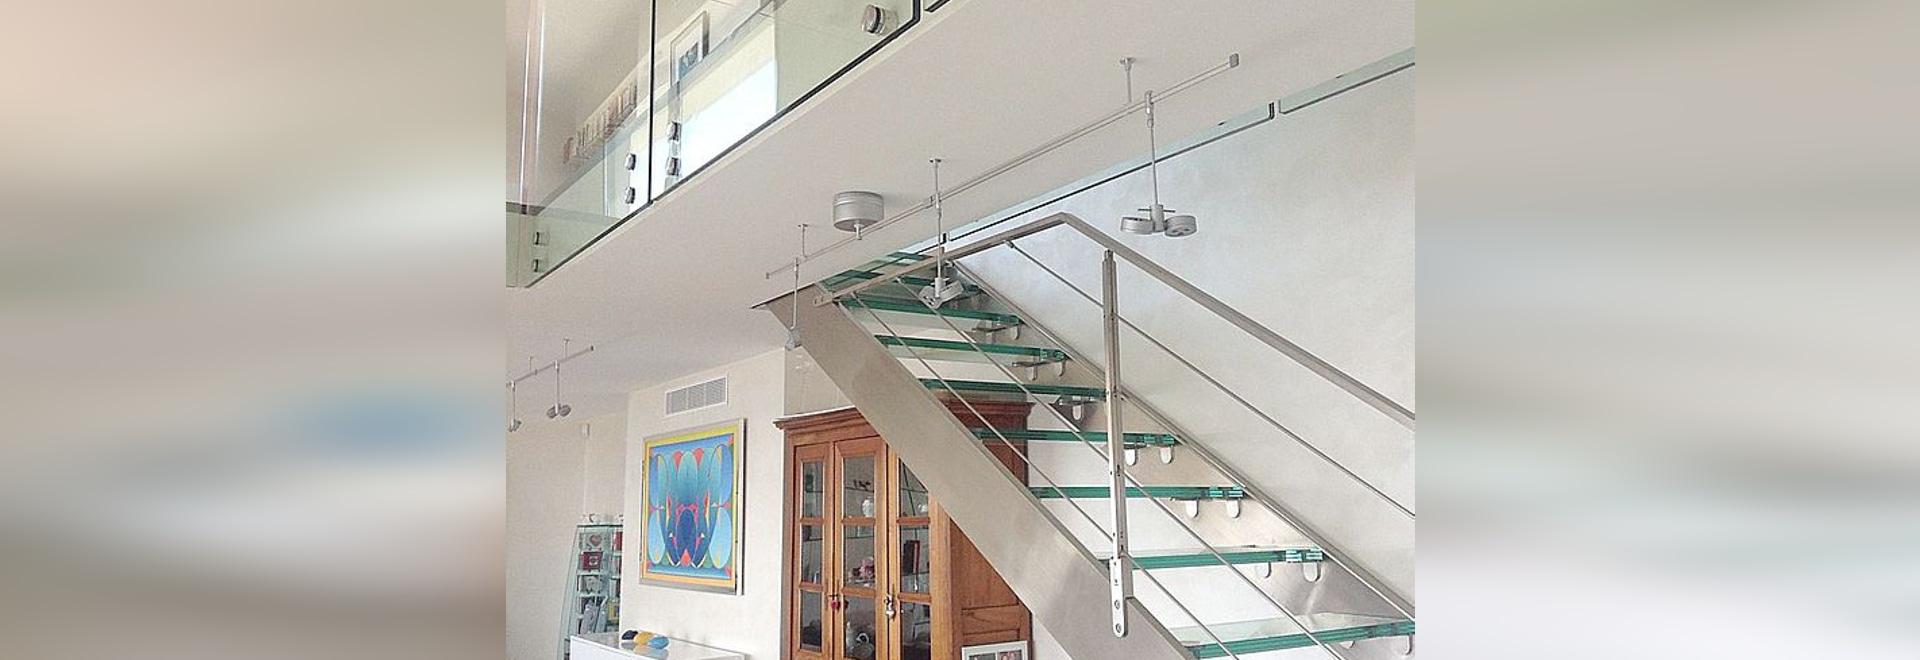 Escalier Elite inox et verre et garde-corps verre Glassy ...